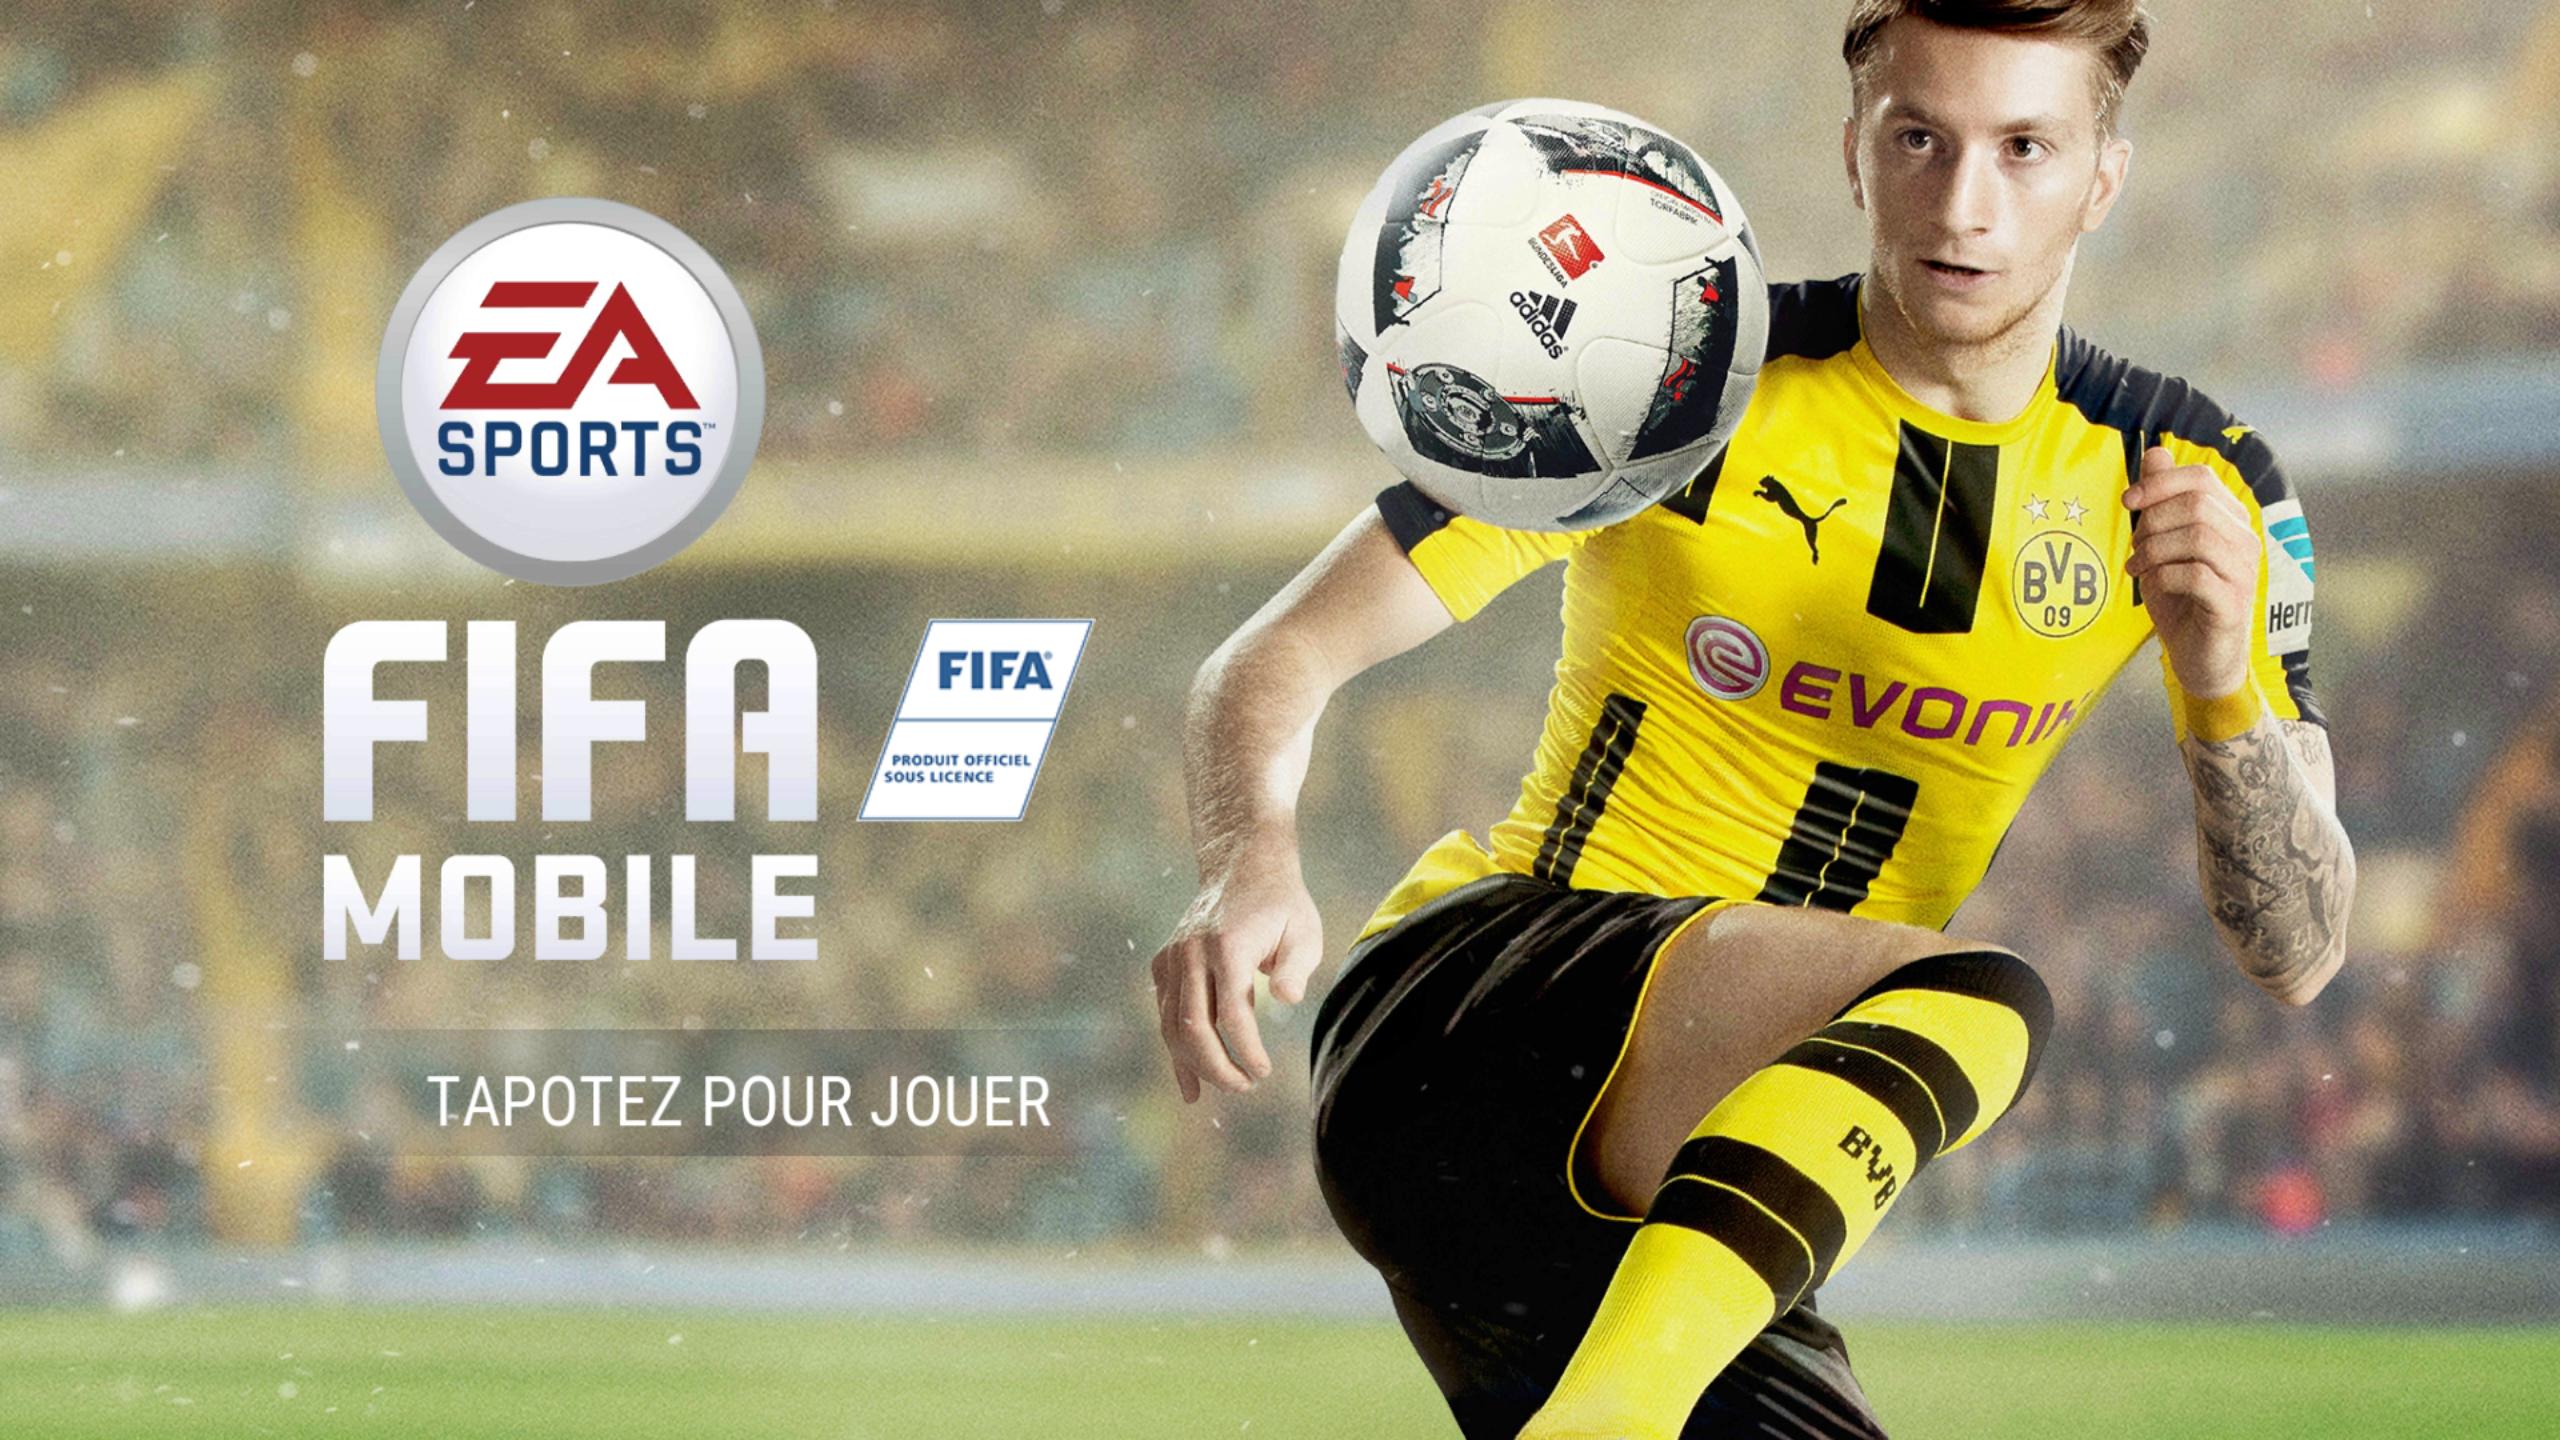 fifa-mobile-football-1